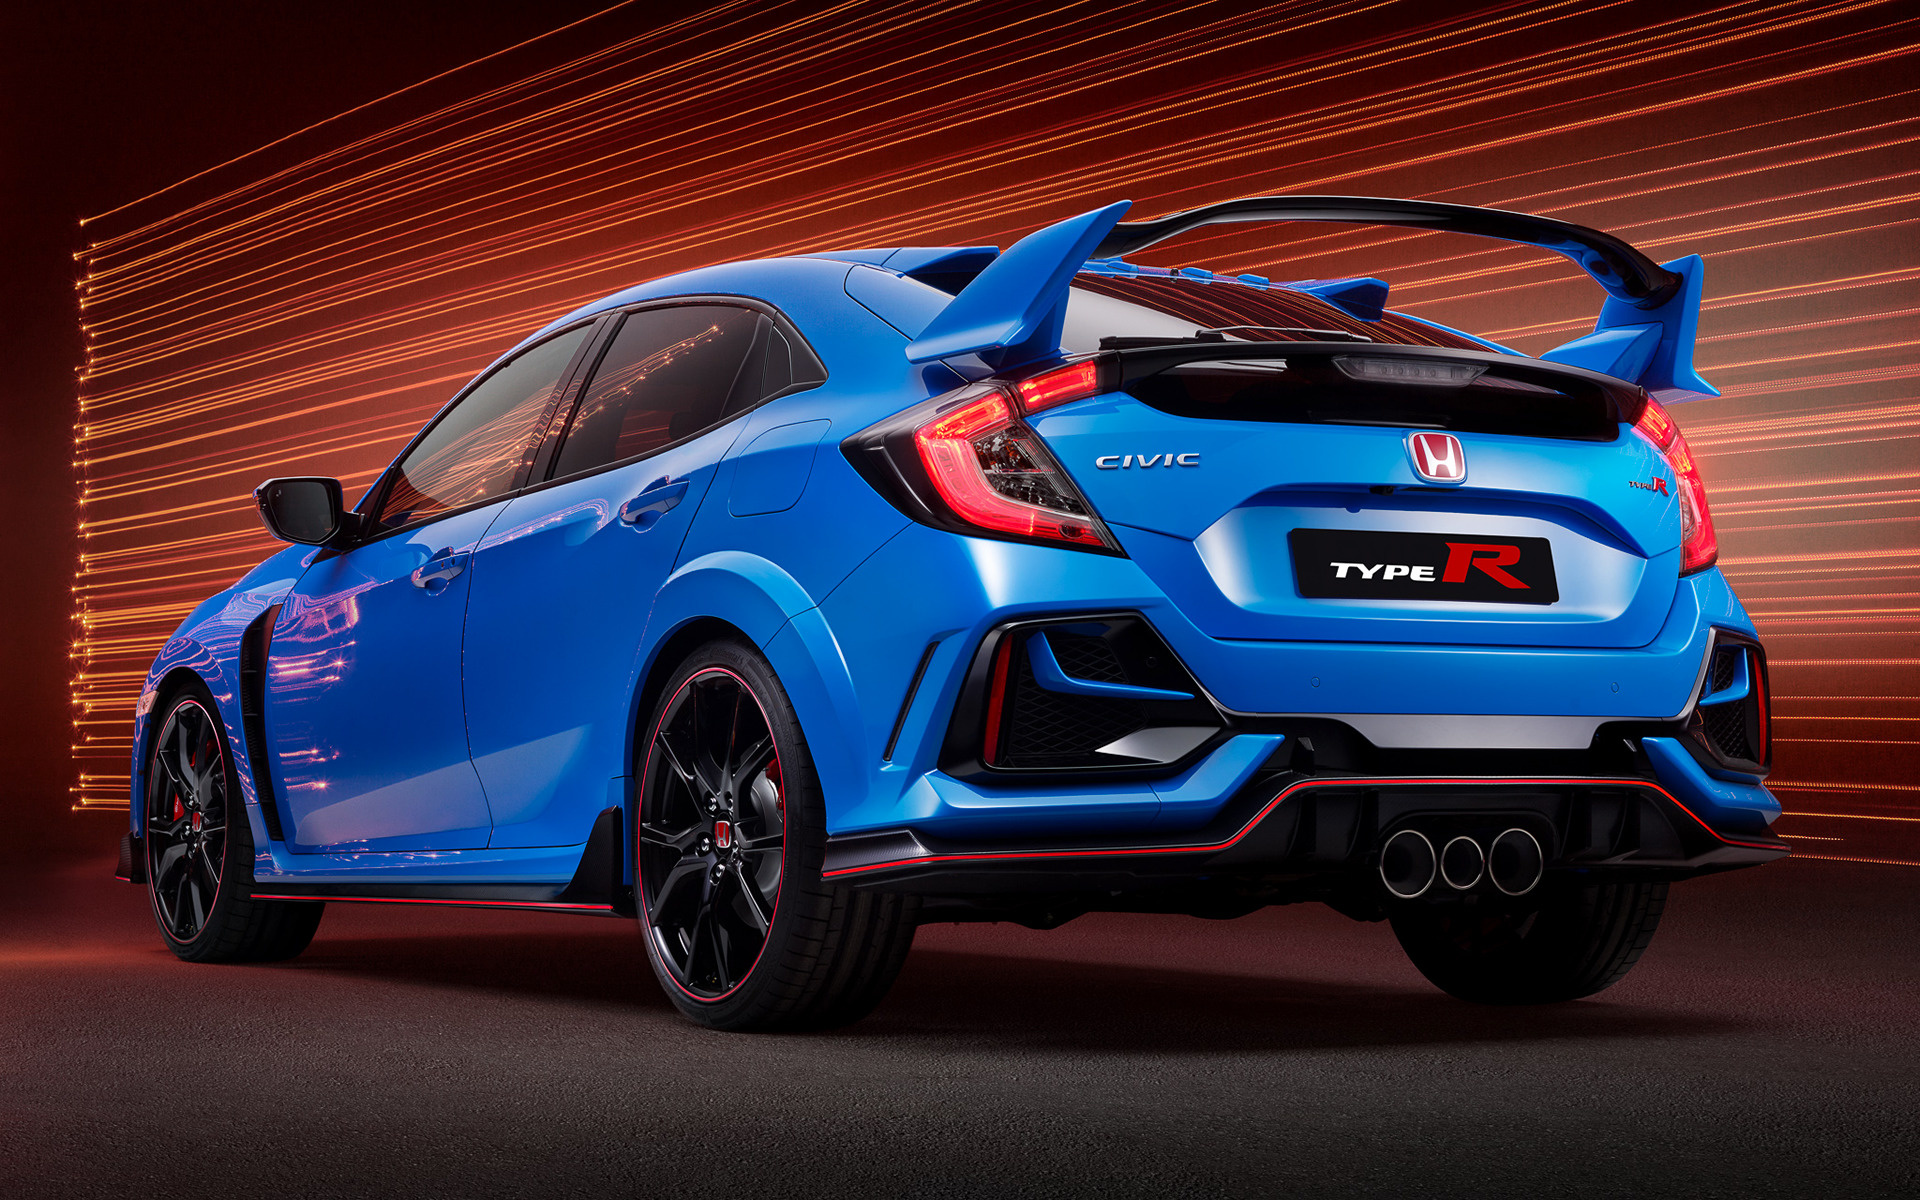 2020 Dodge Ram >> 2020 Honda Civic Type R - Wallpapers and HD Images | Car Pixel